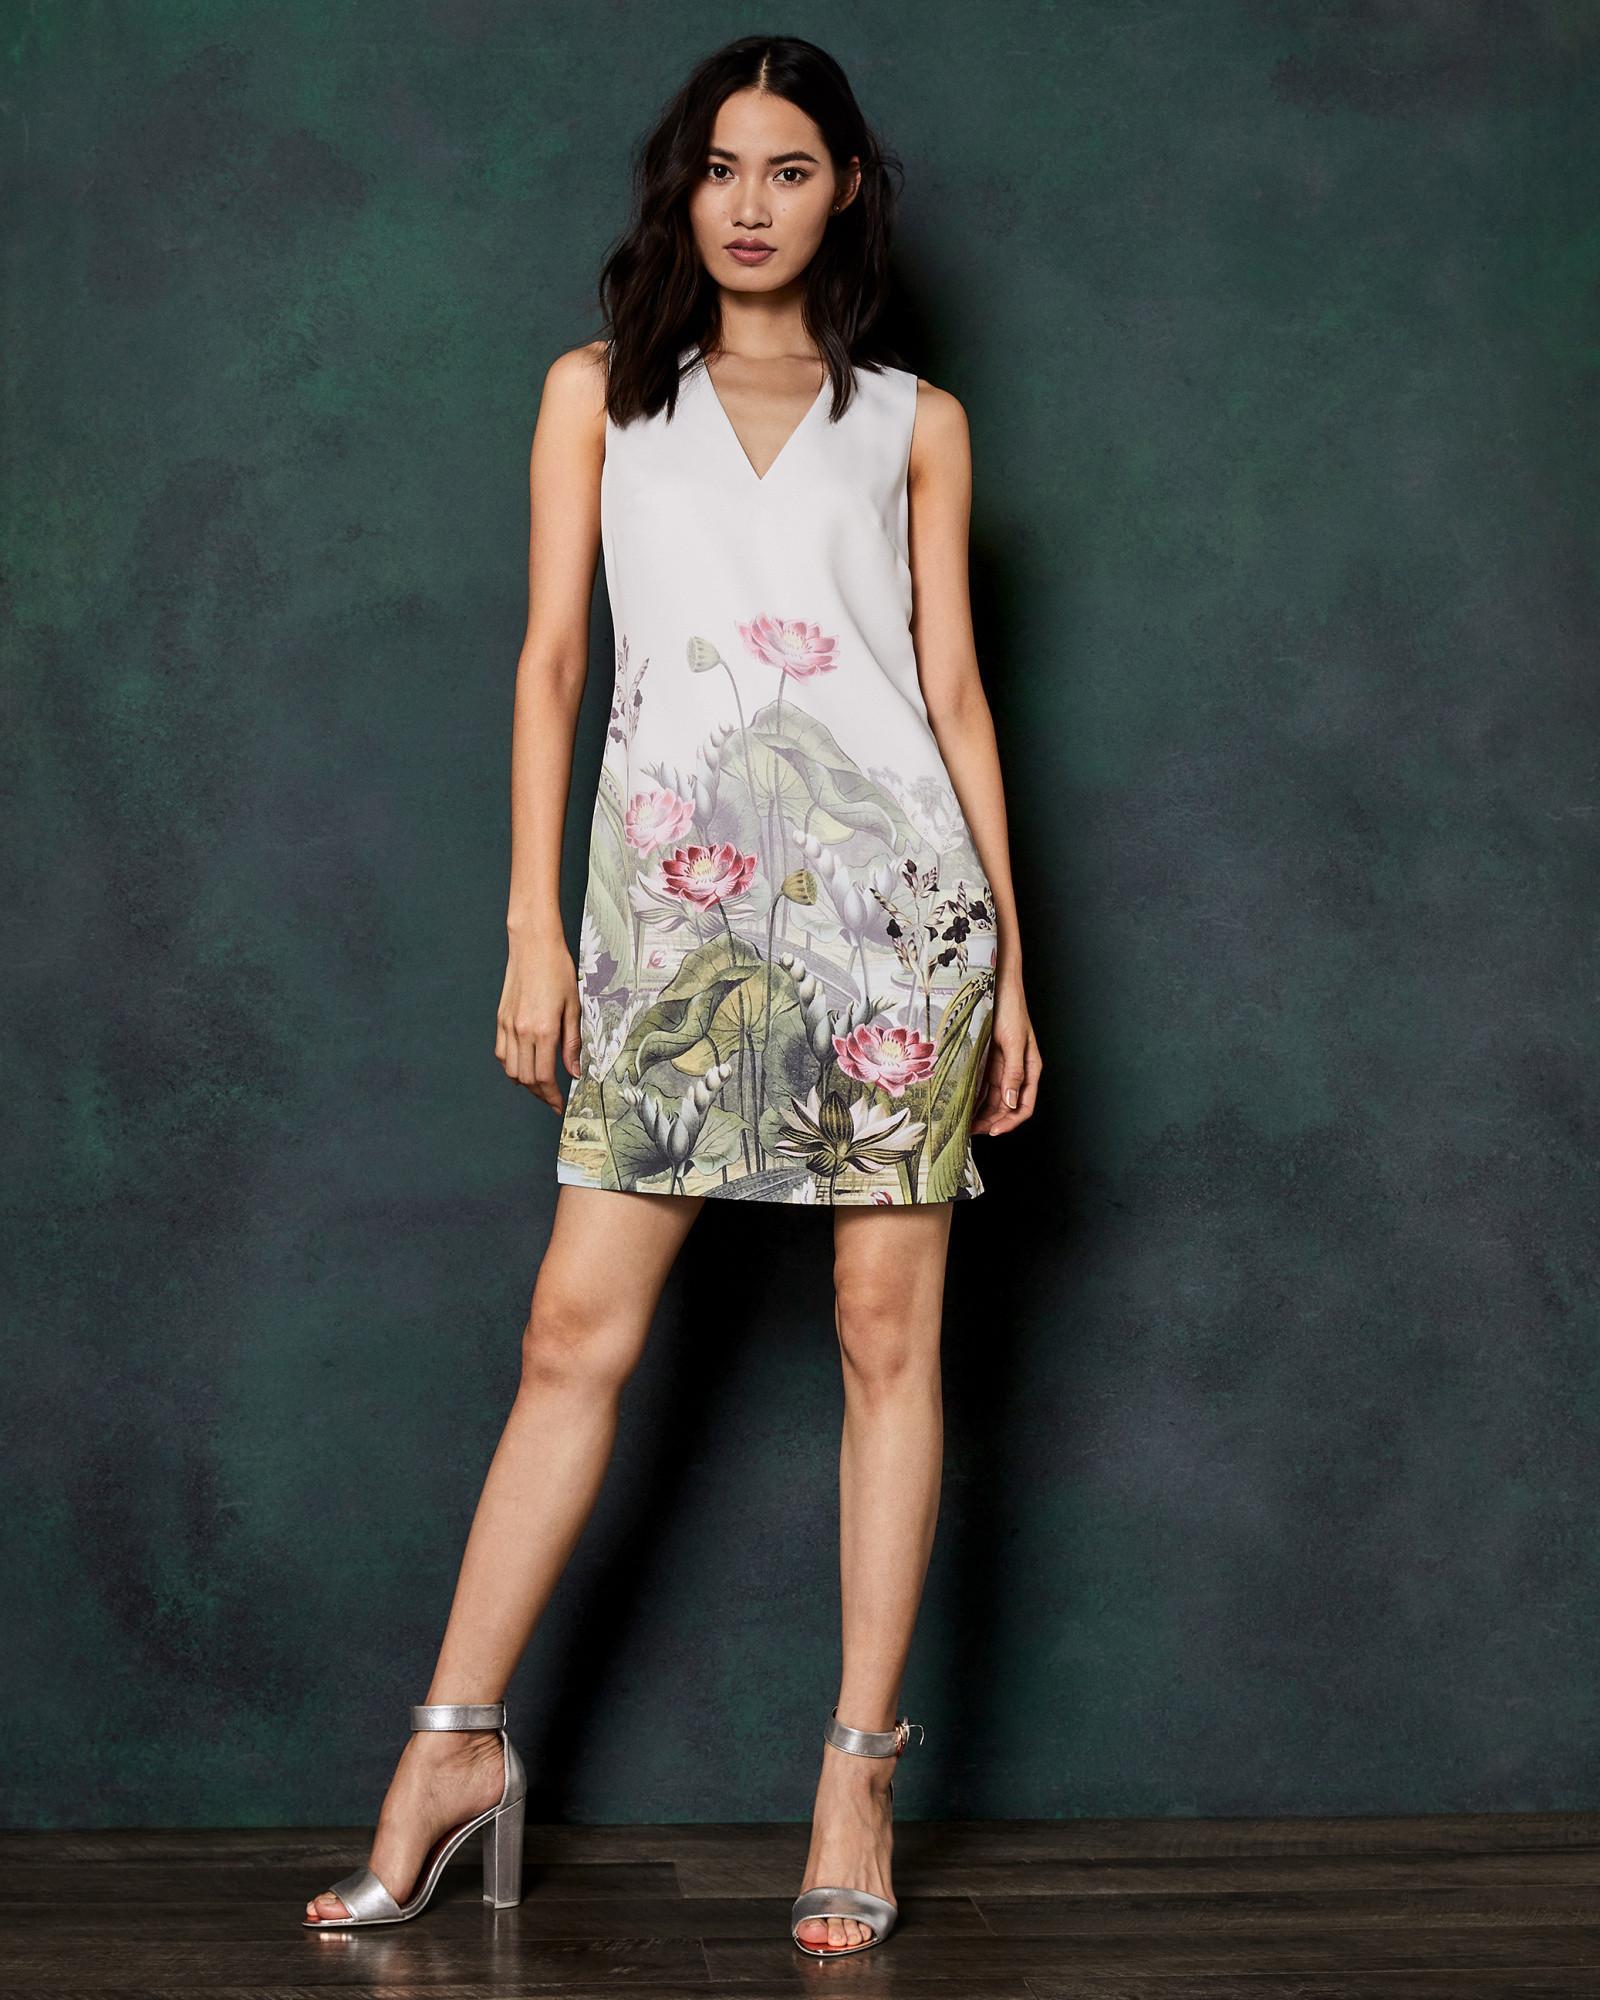 b44d990ea Ted Baker Wonderland Waterfall Dress in White - Save 30% - Lyst